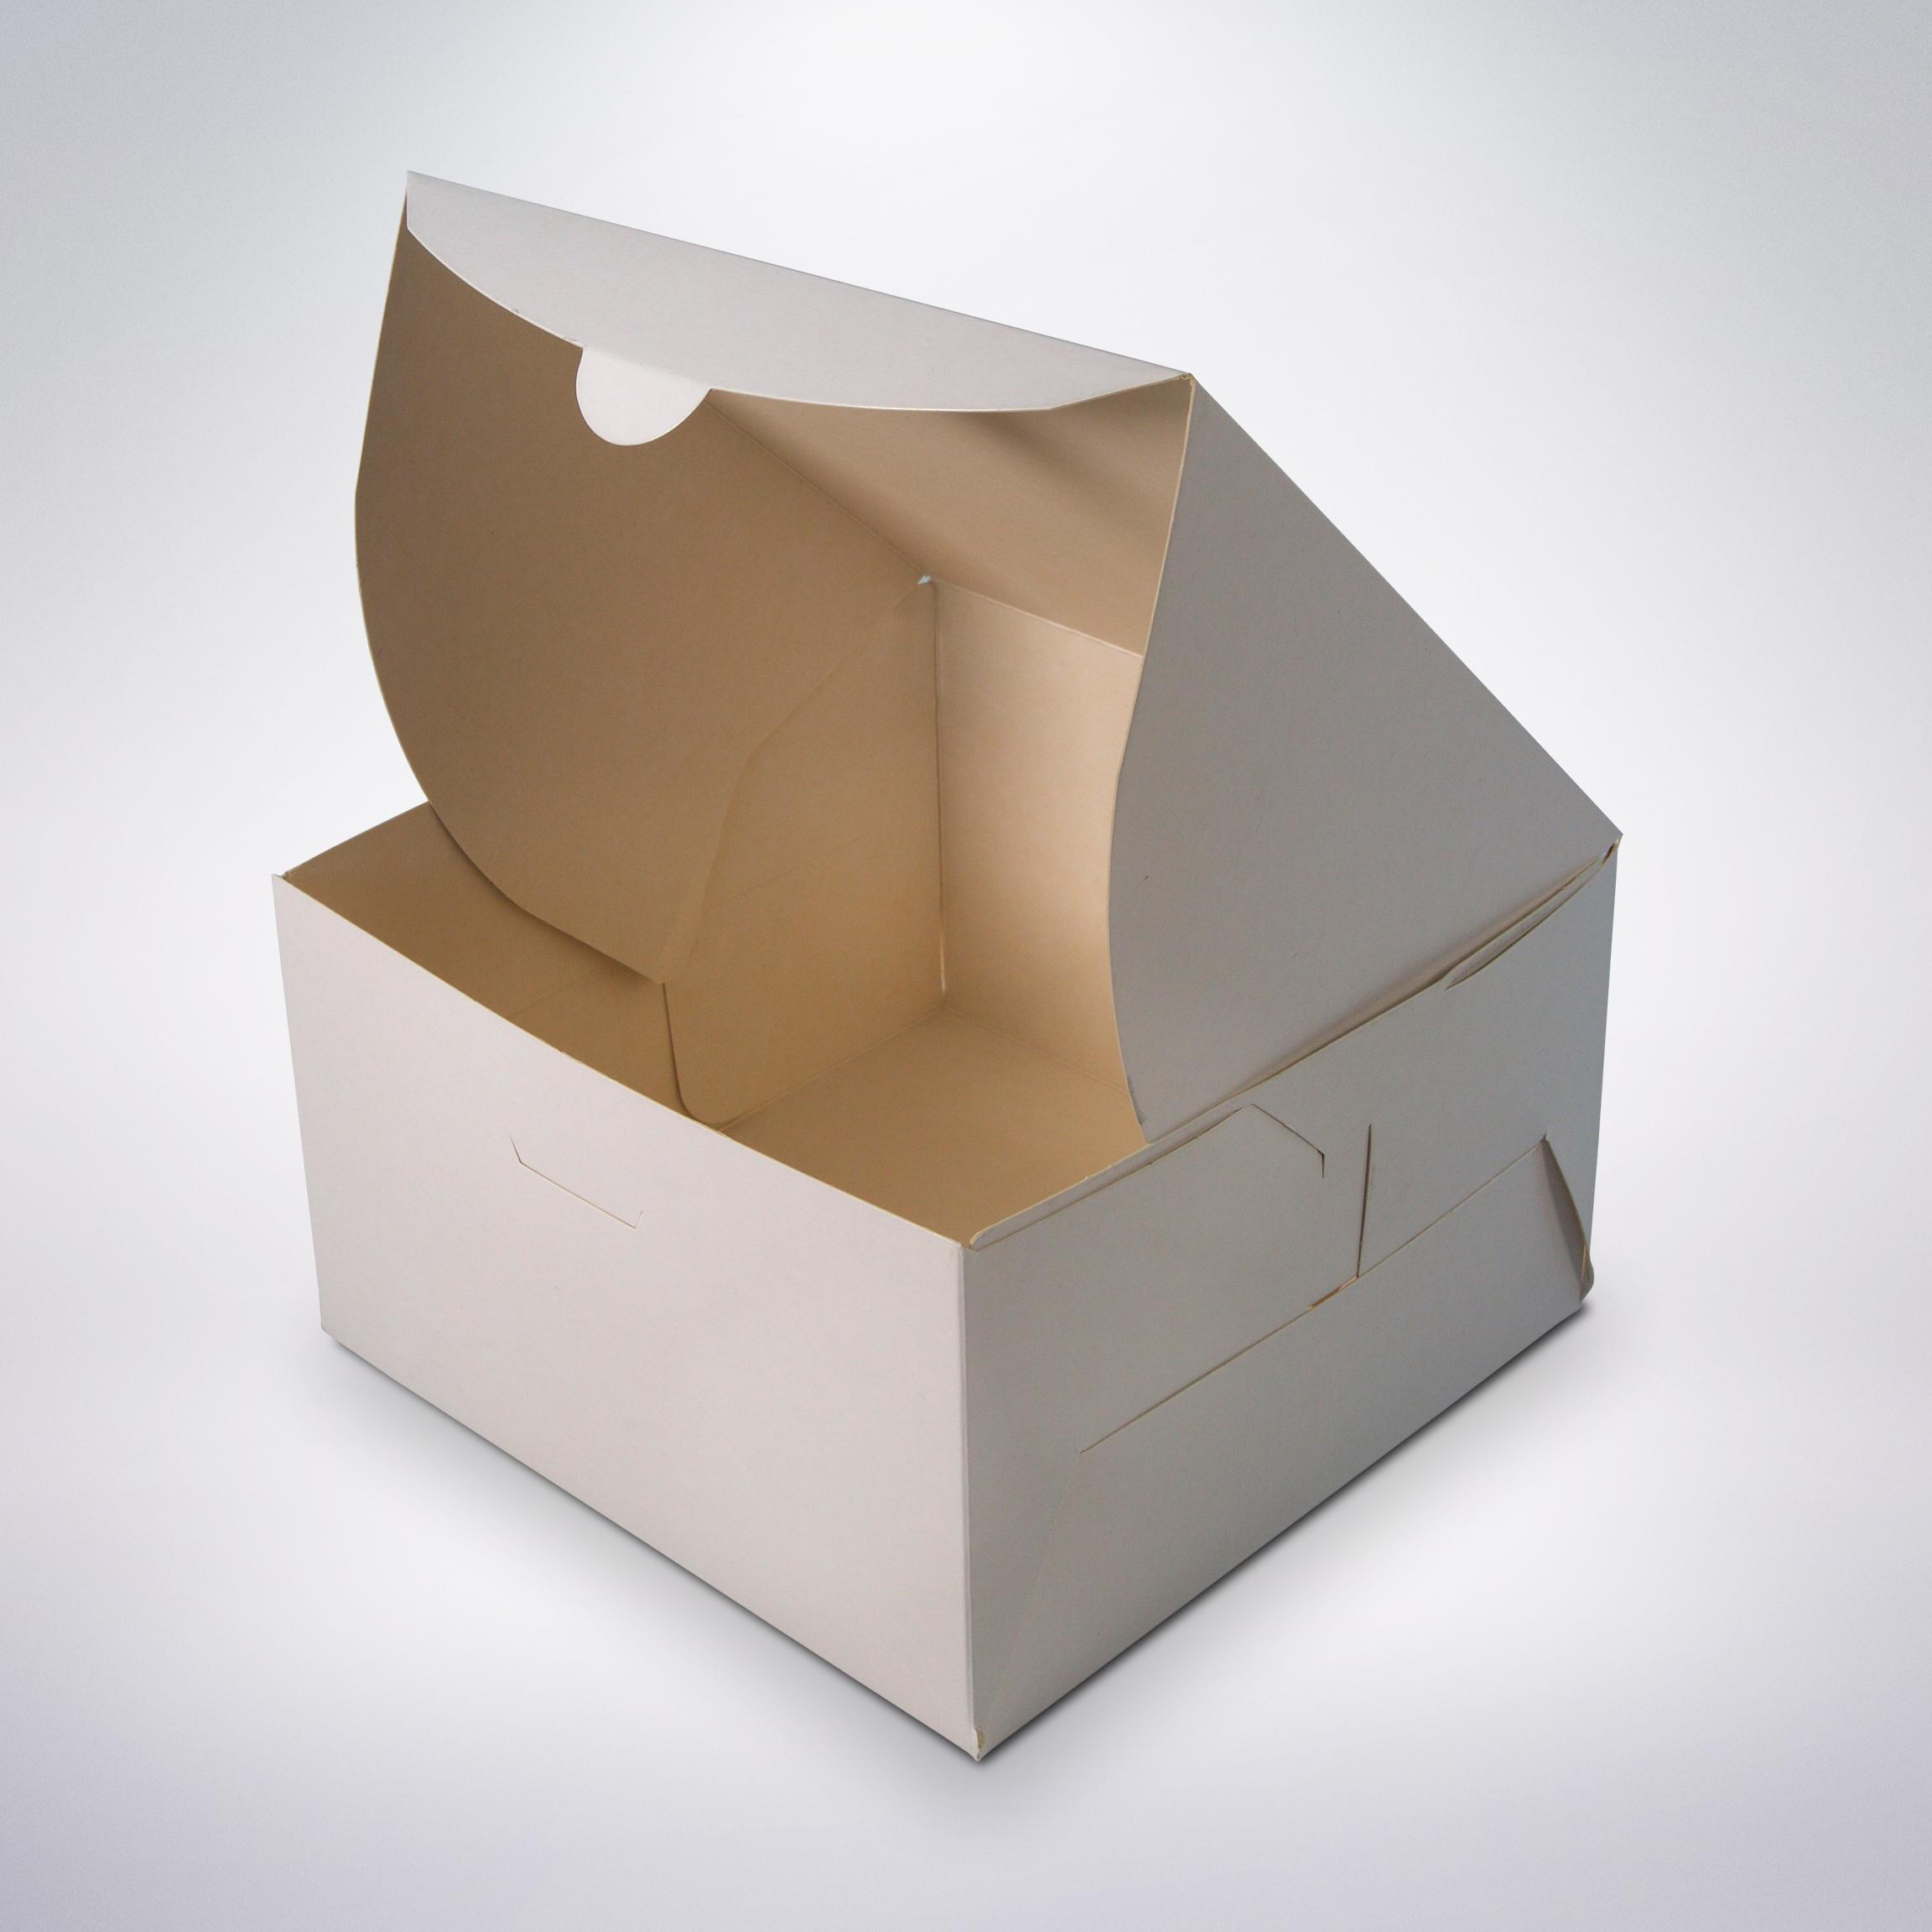 Cukrárska krabica 180x180x110